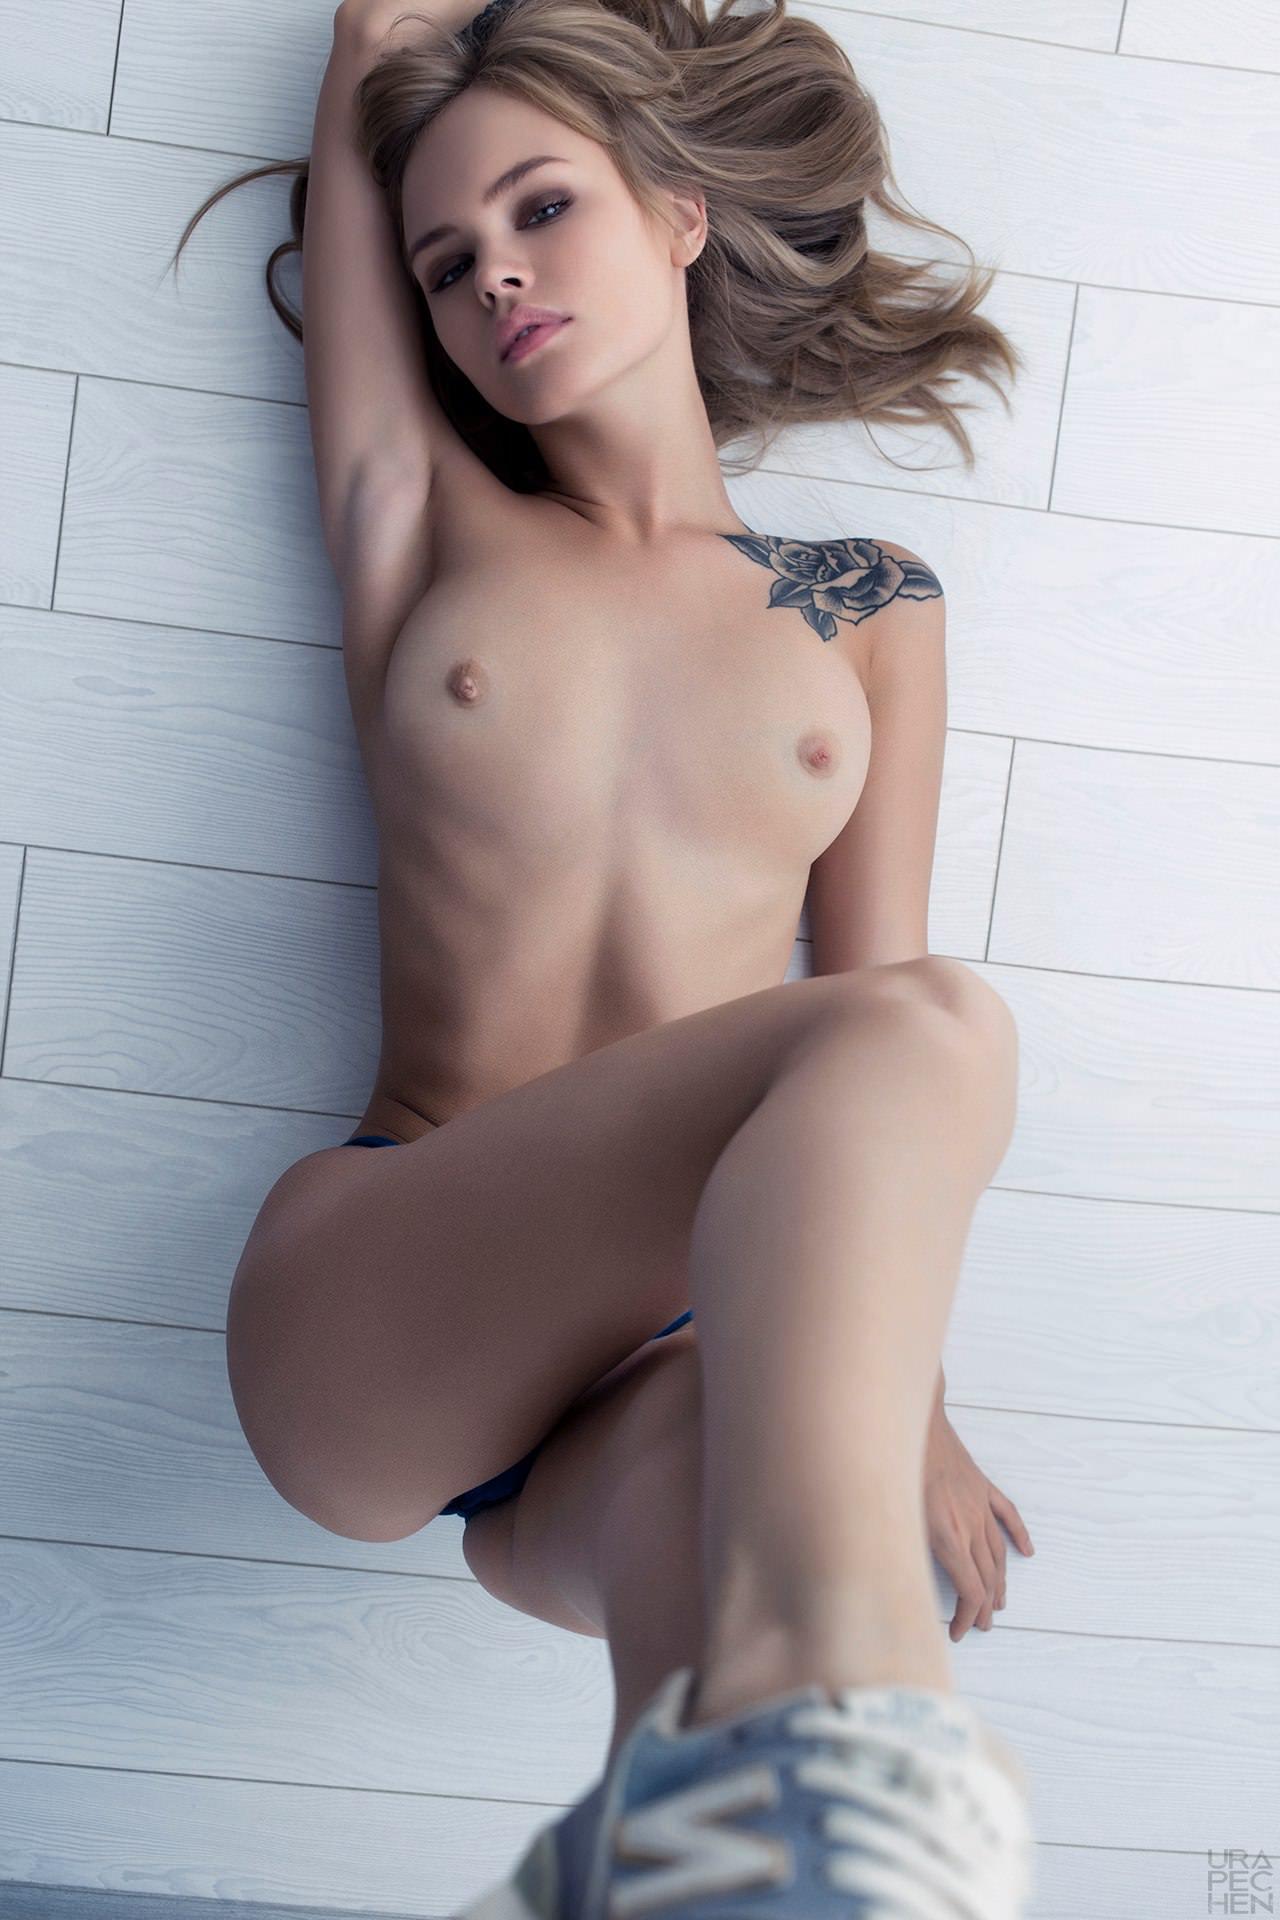 Anastasia Shcheglova Nude anastasia shcheglova porn pic - eporner